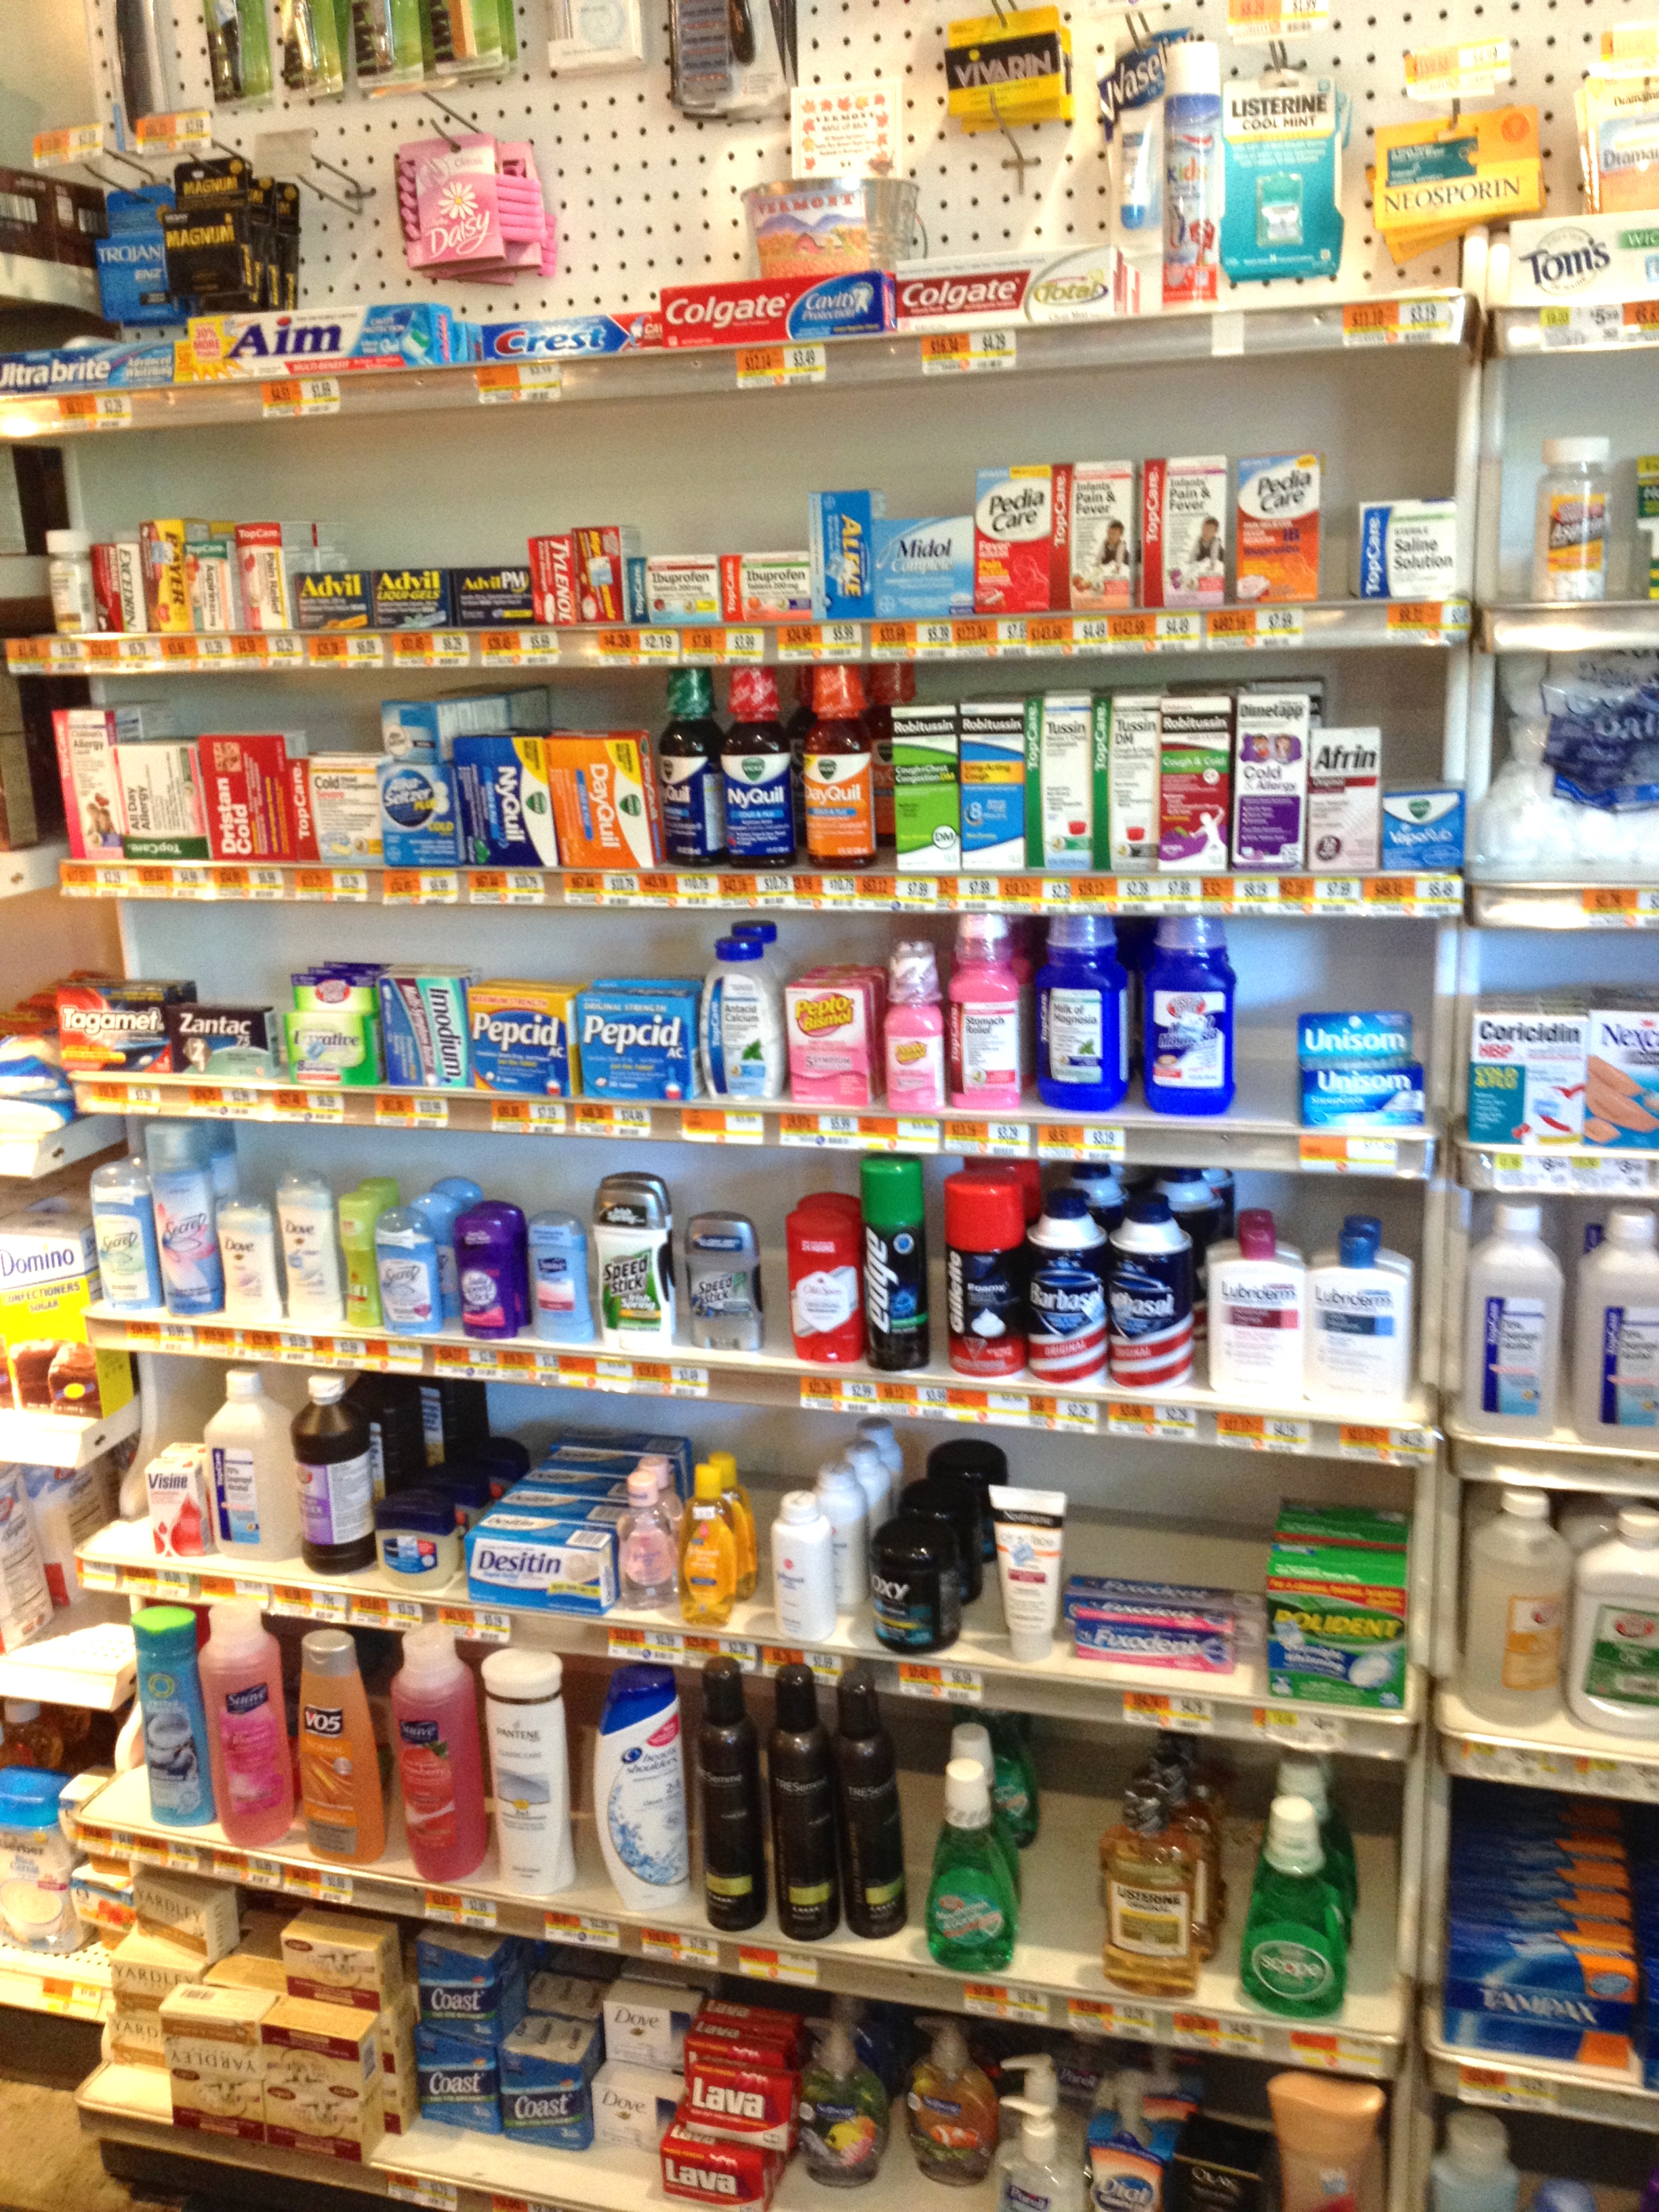 wardsboro_country_store_toiletries.jpg